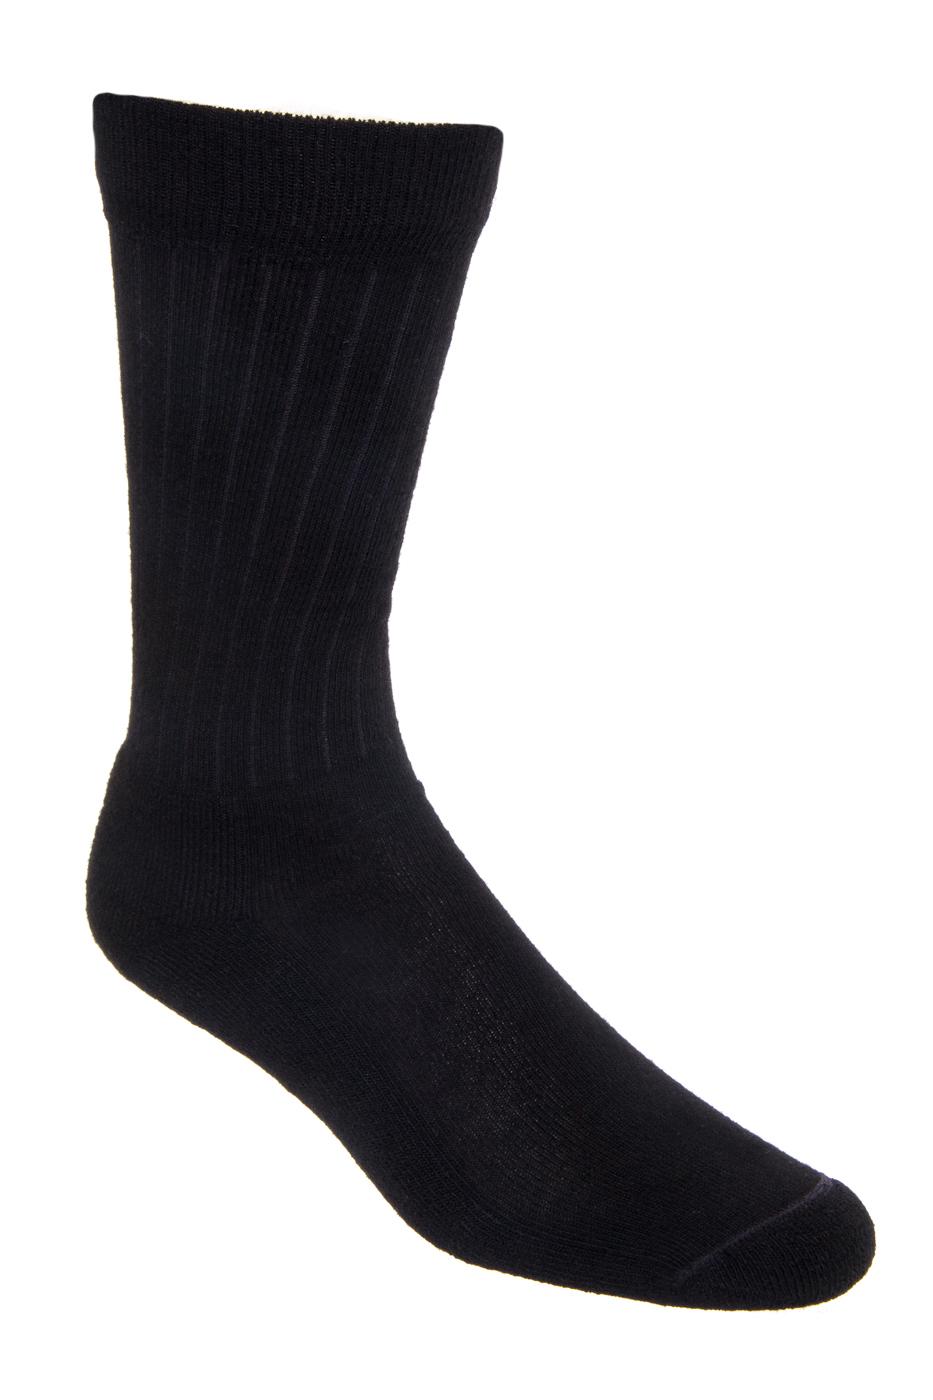 Red Wing Men's Classic Rib 97161 Sock - Black